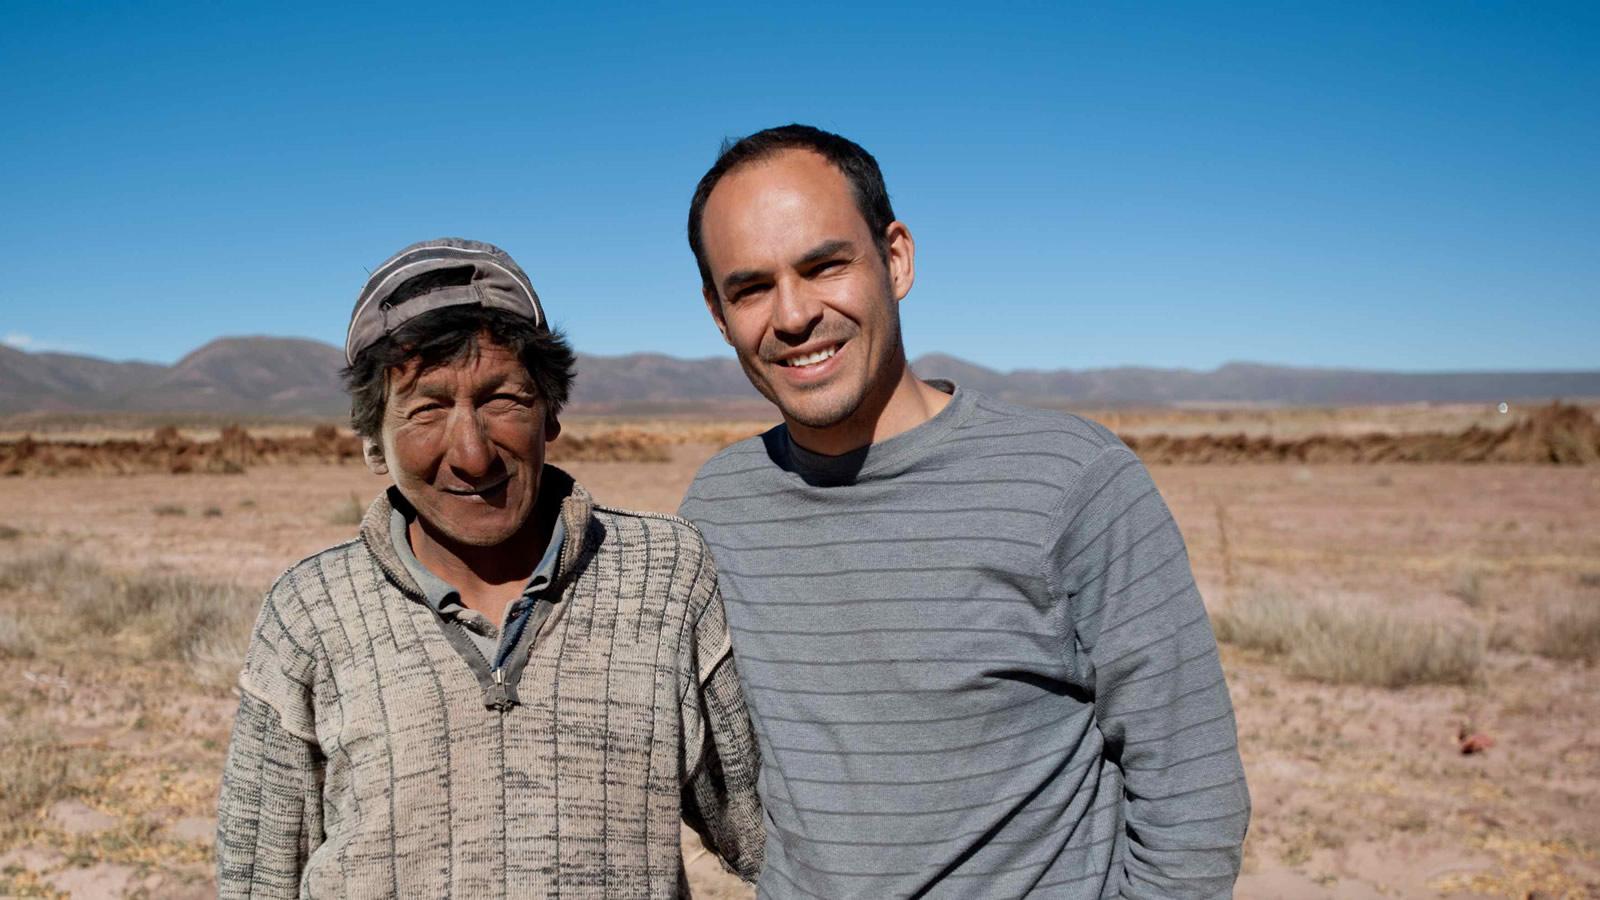 Sergio Núñez De Arco and a Bolivian farmer